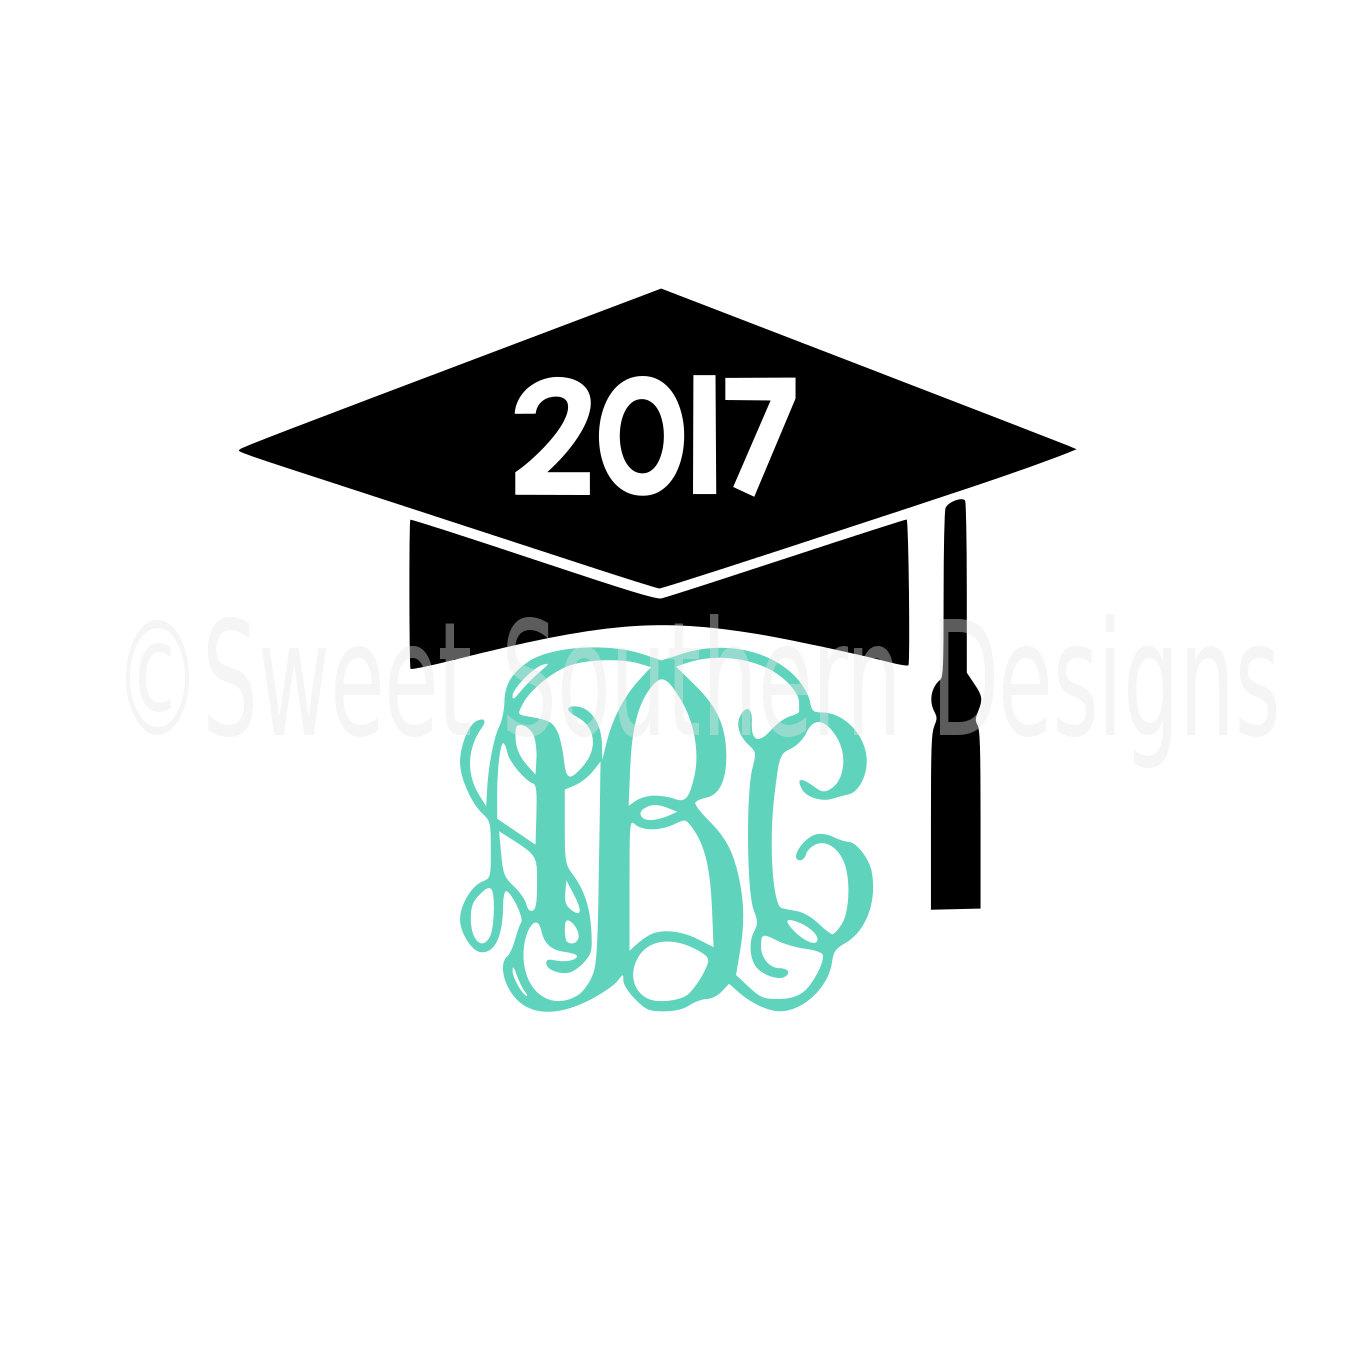 Clipart Graduation Cap 2017 - Best Clipart Gallery •